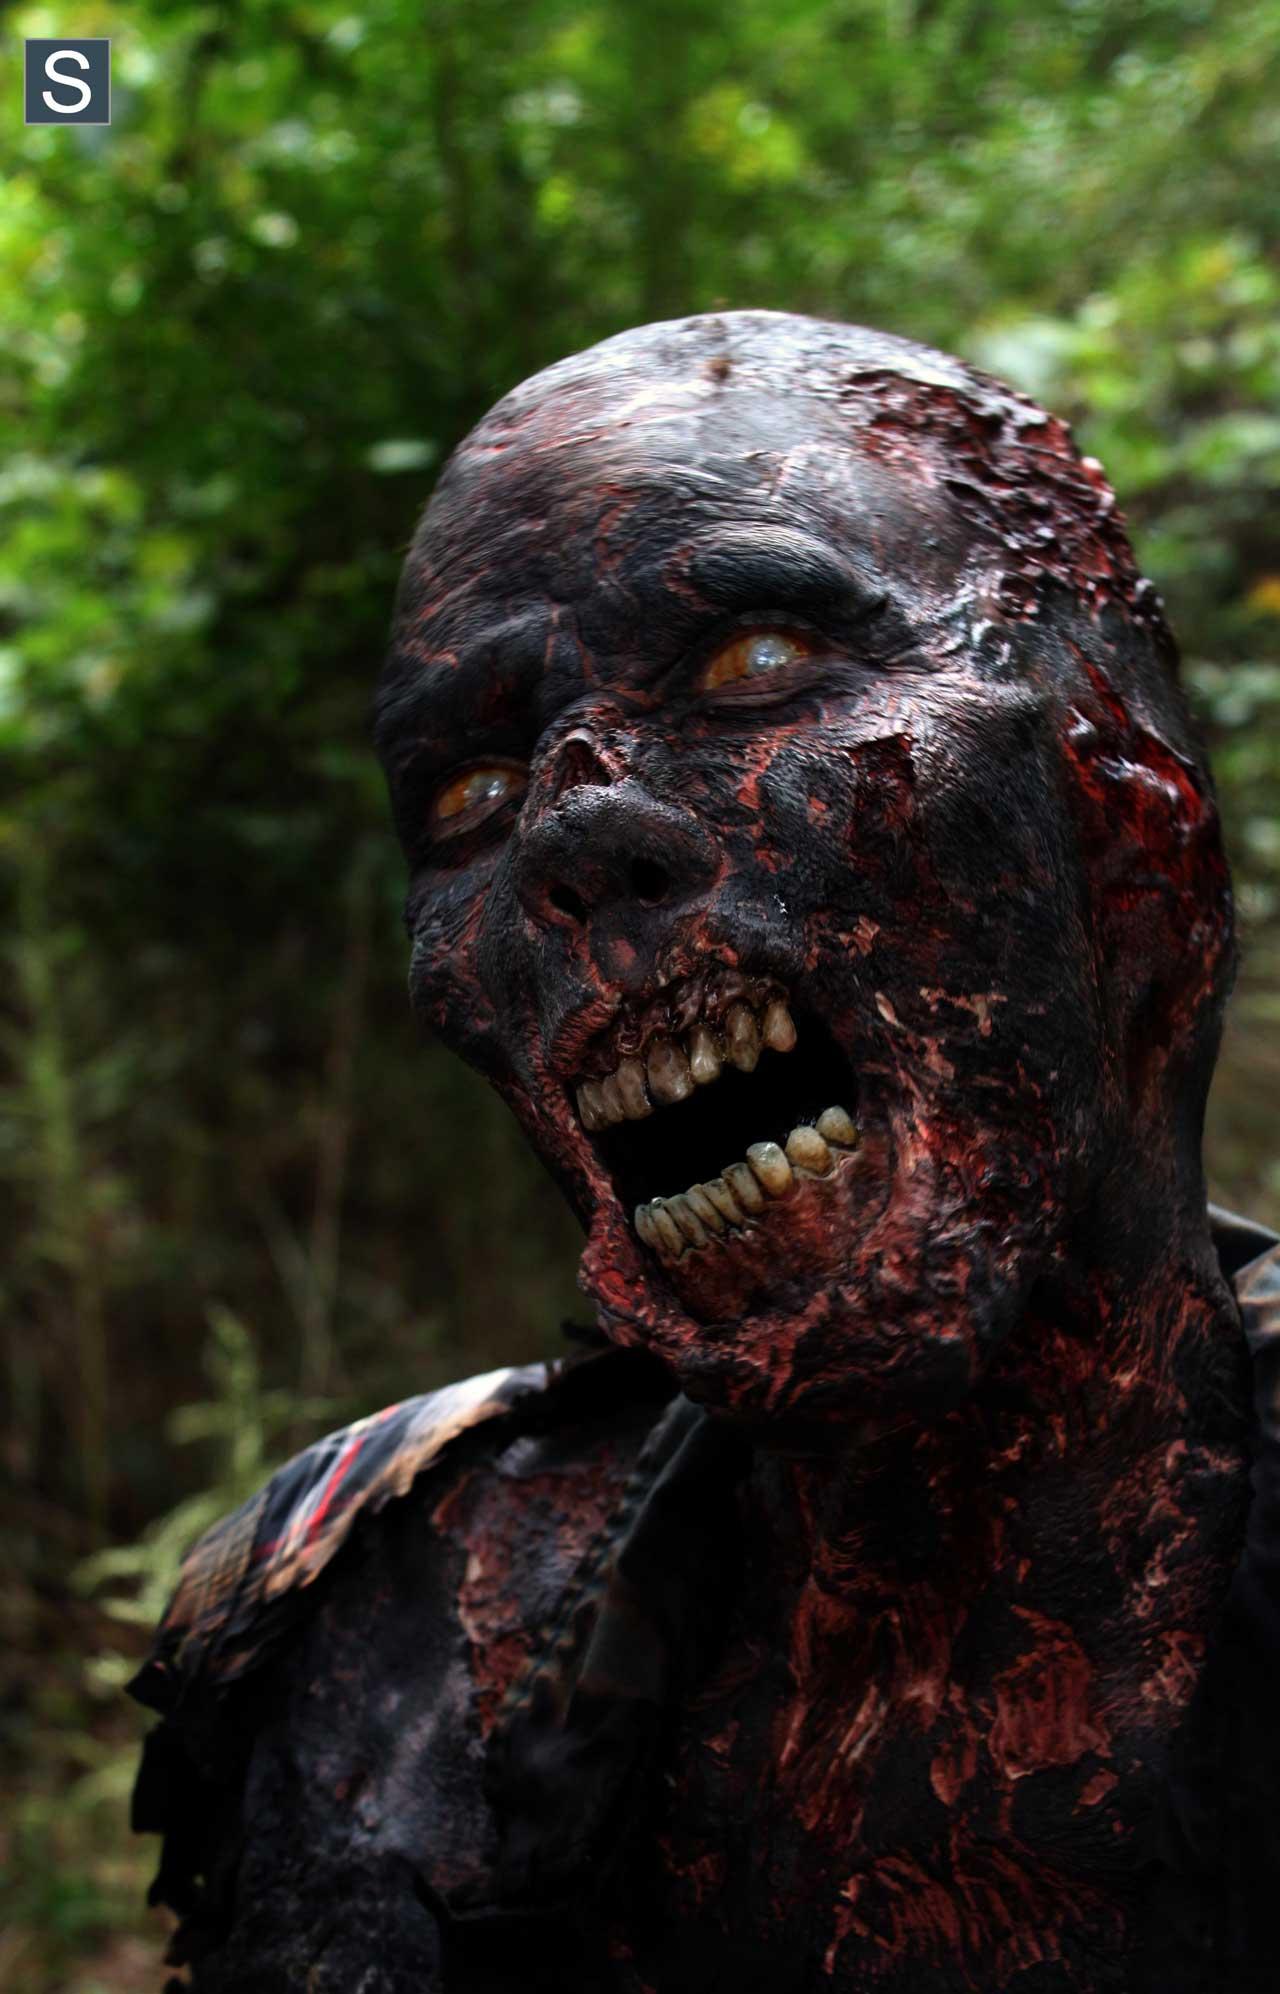 Zumbi Queimado do 14º episódio da 4ª Temporada de The Walking Dead.